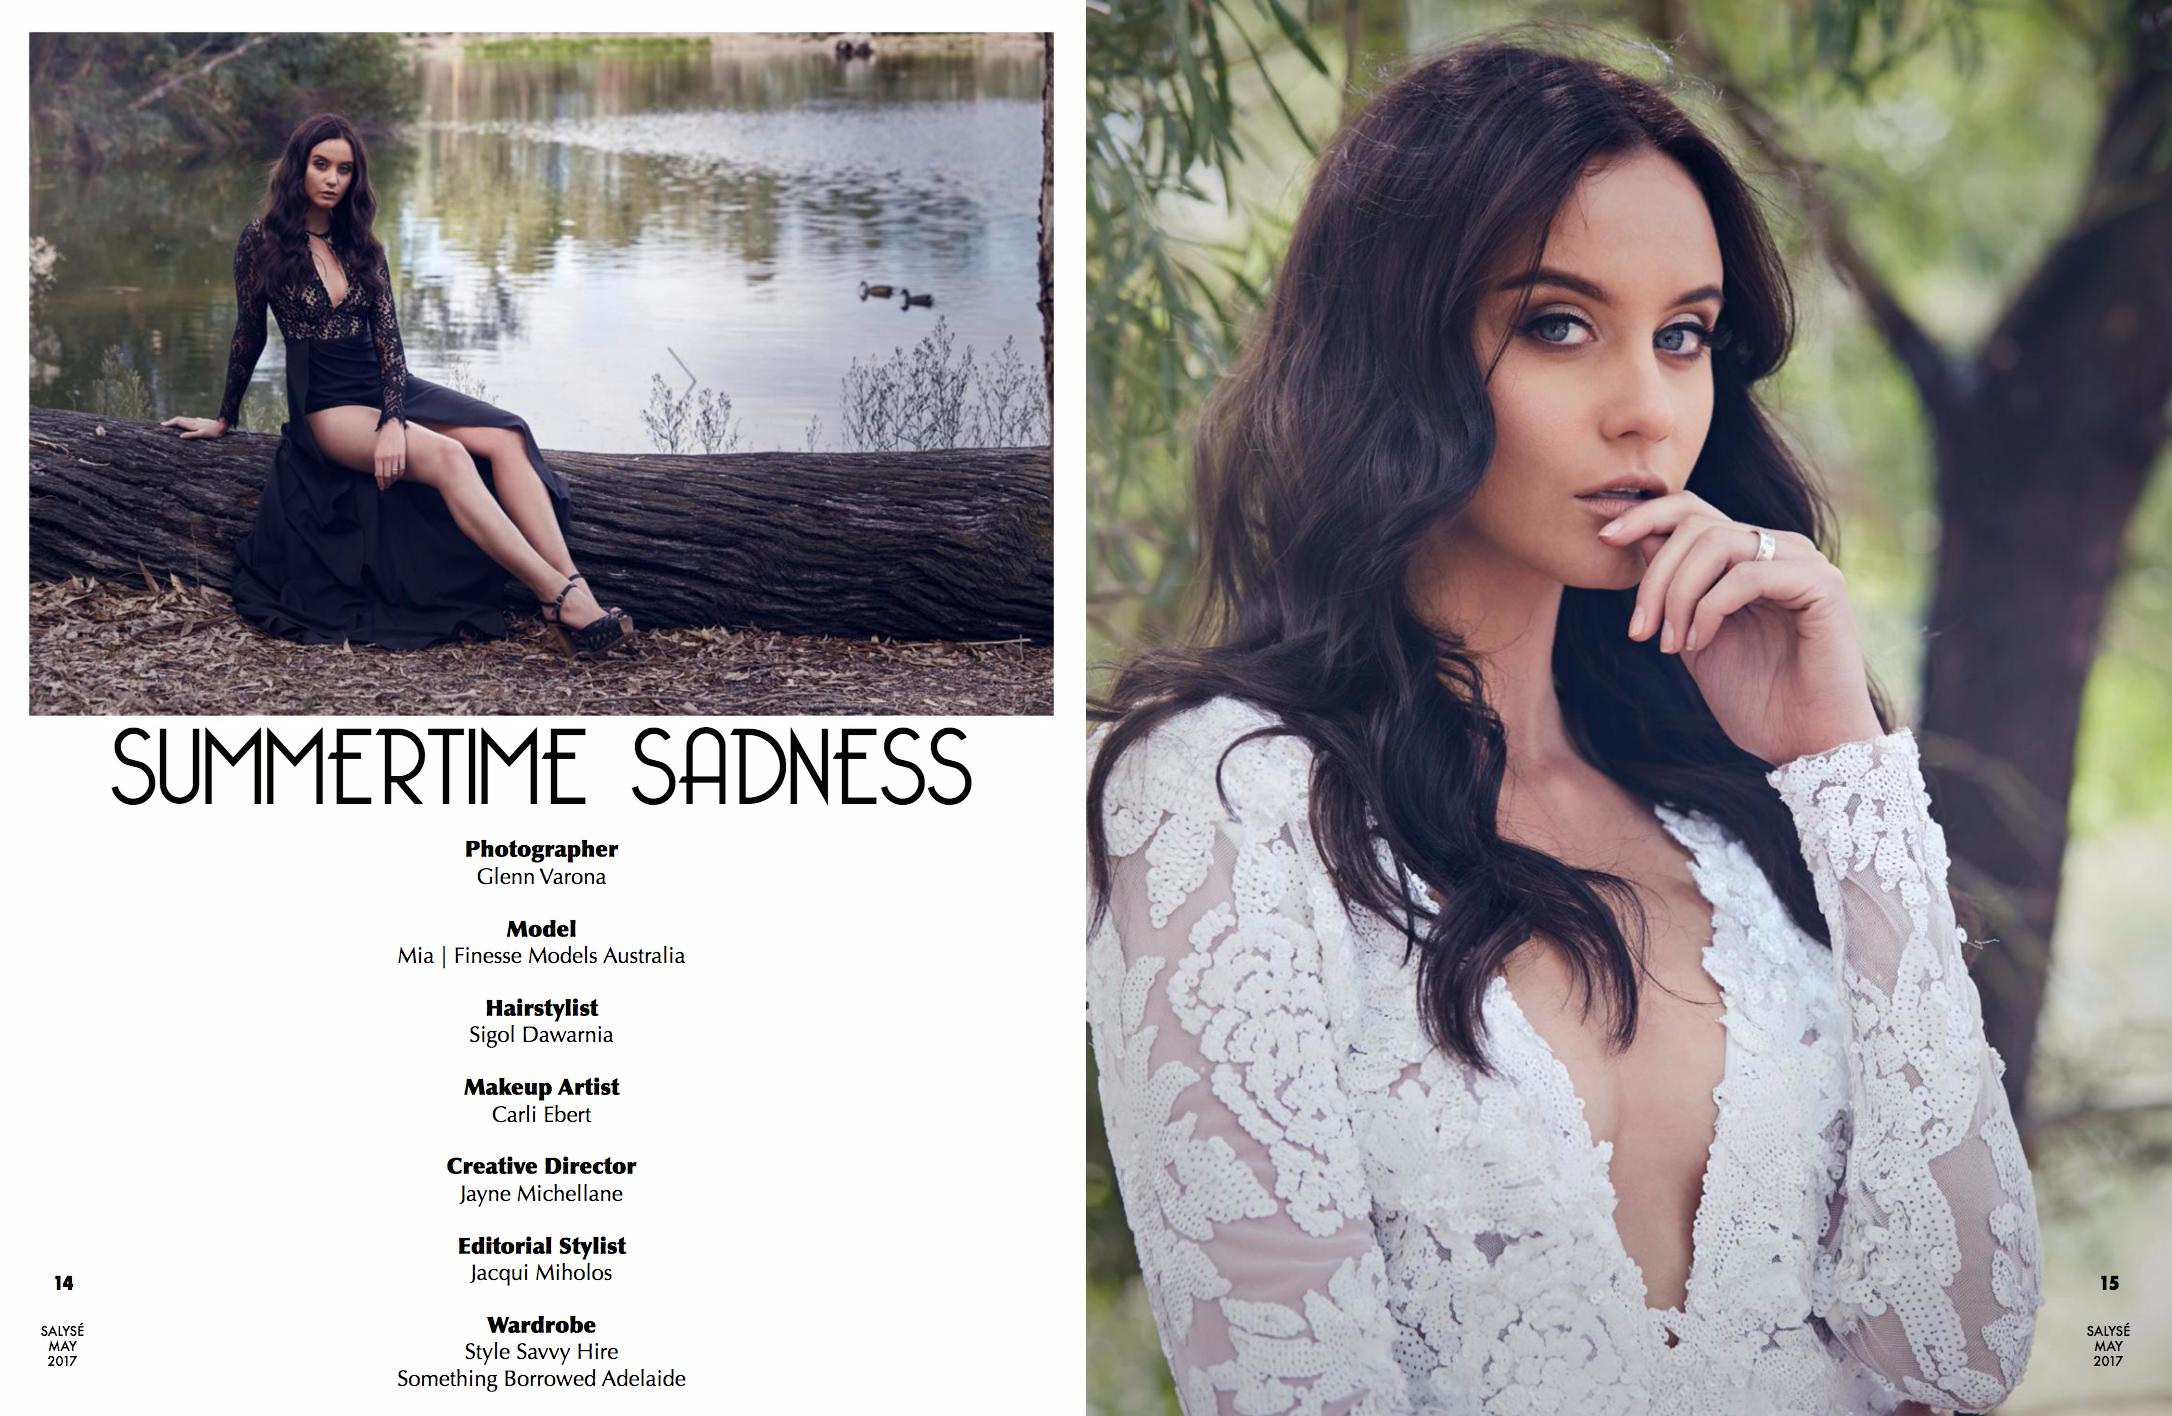 Summertime Sadness Editorial